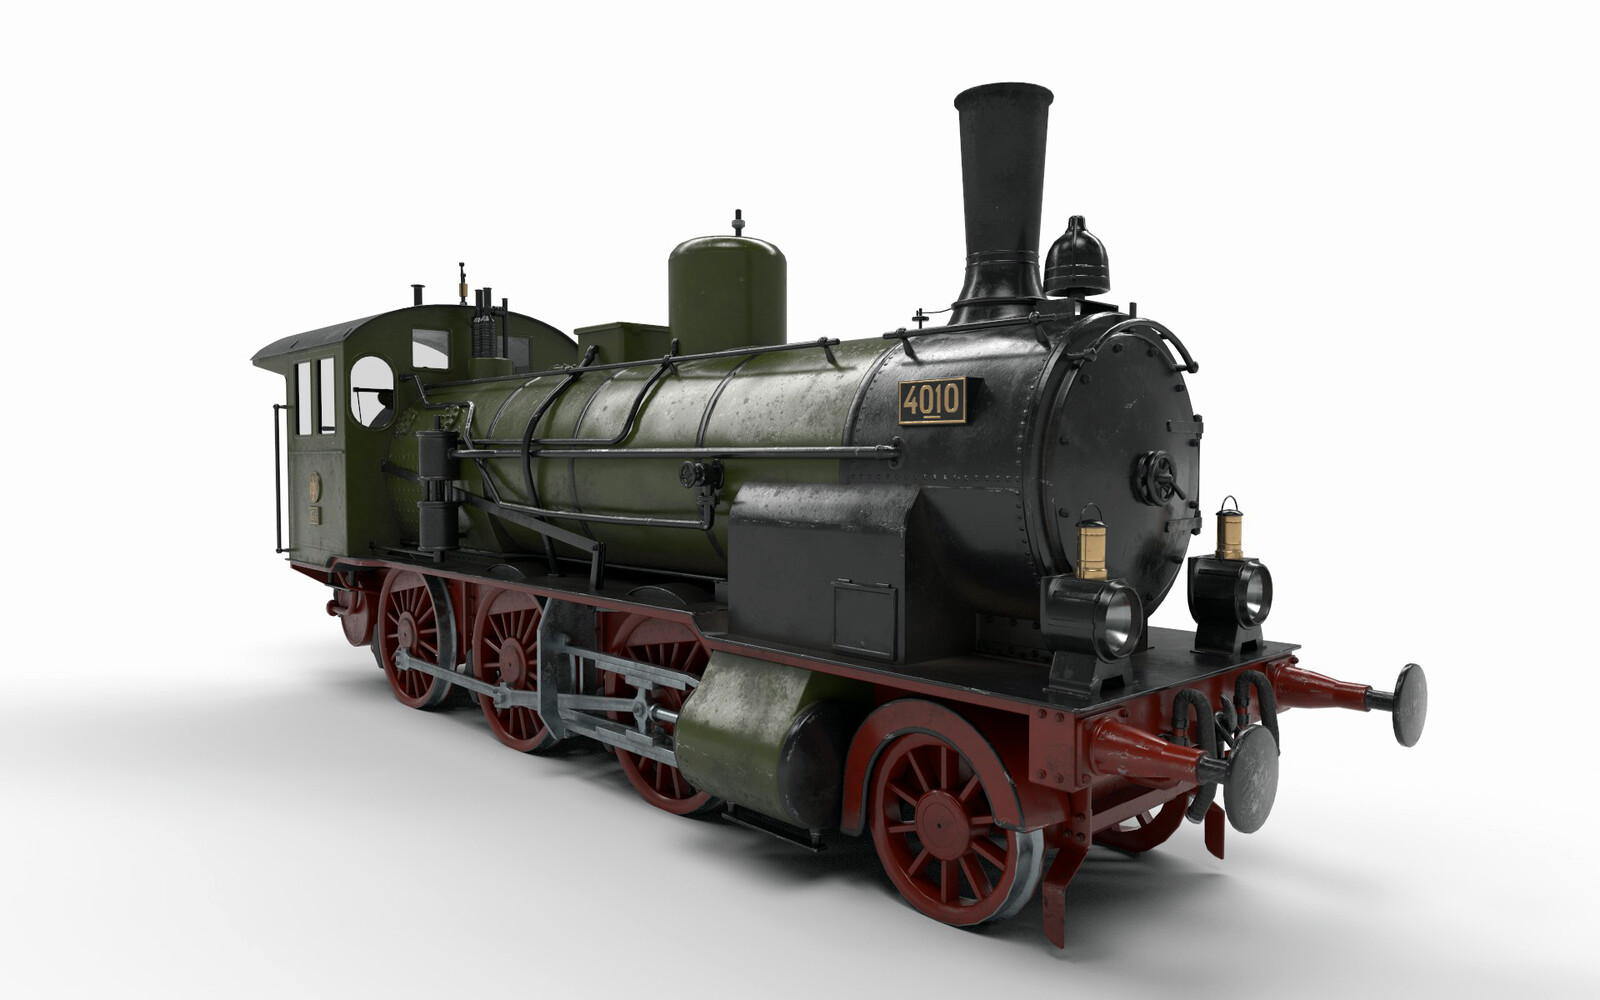 Preus (historical train)